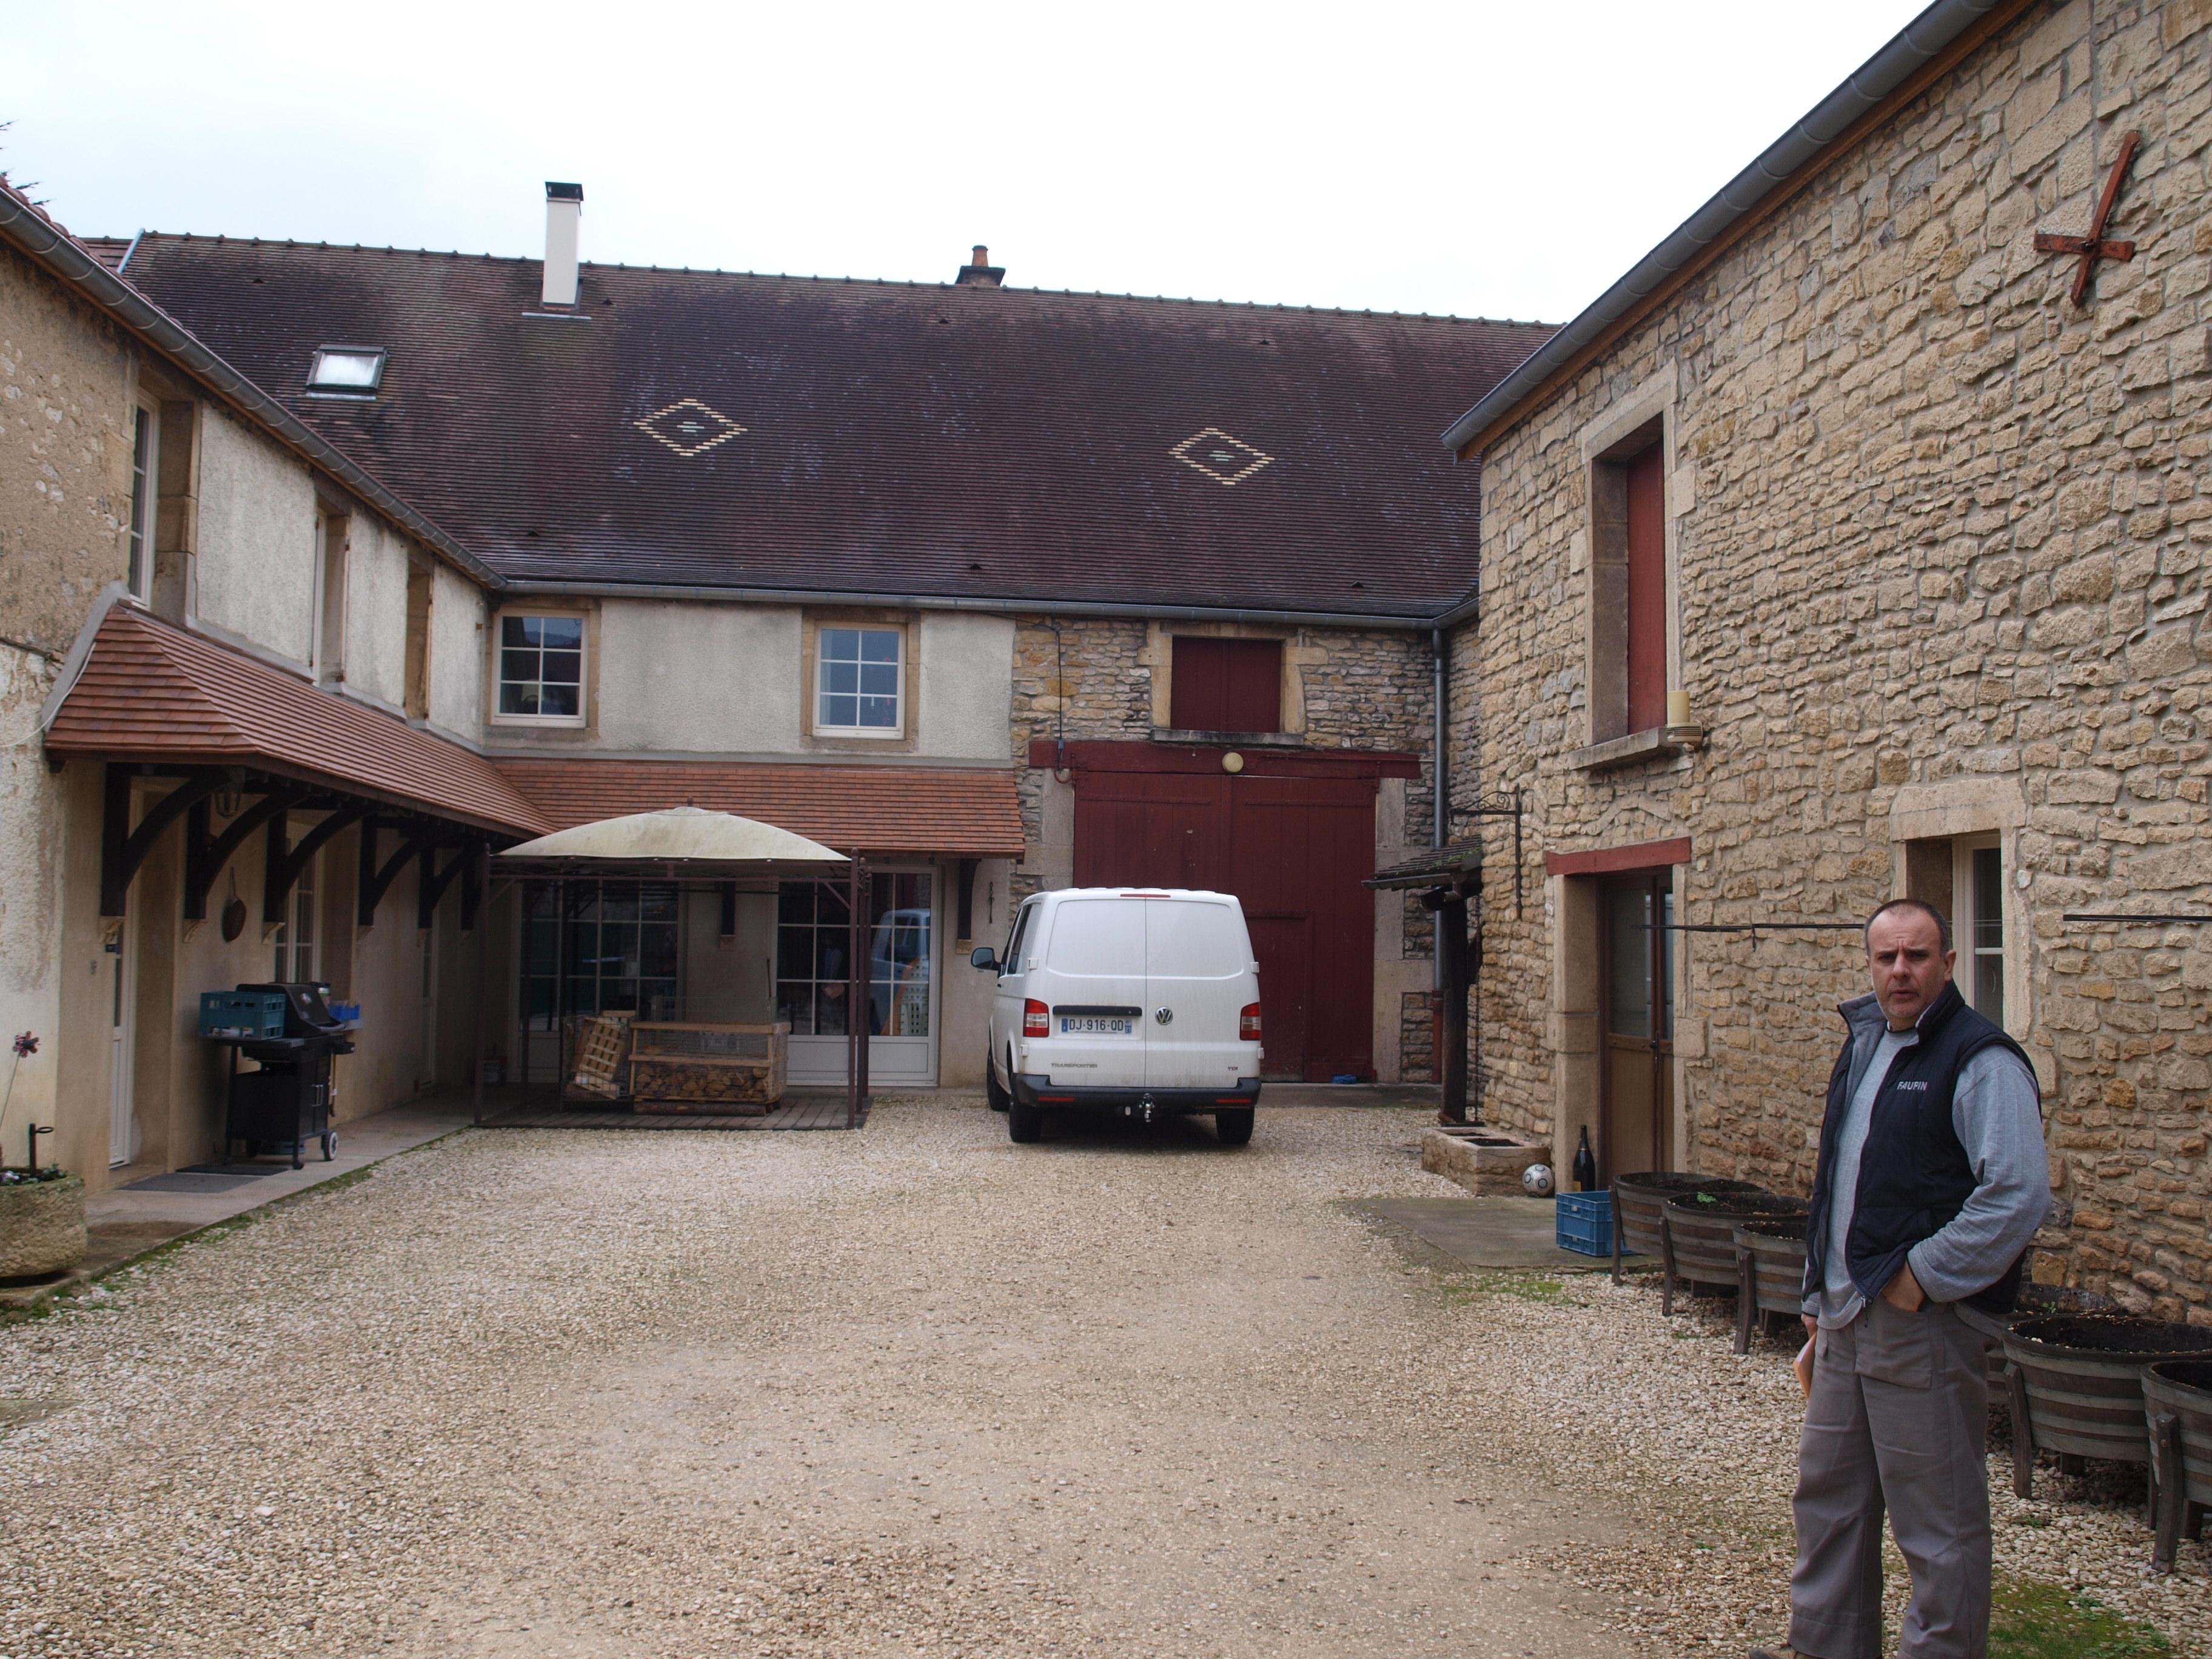 Domaine du Vieux College Eric Guyard